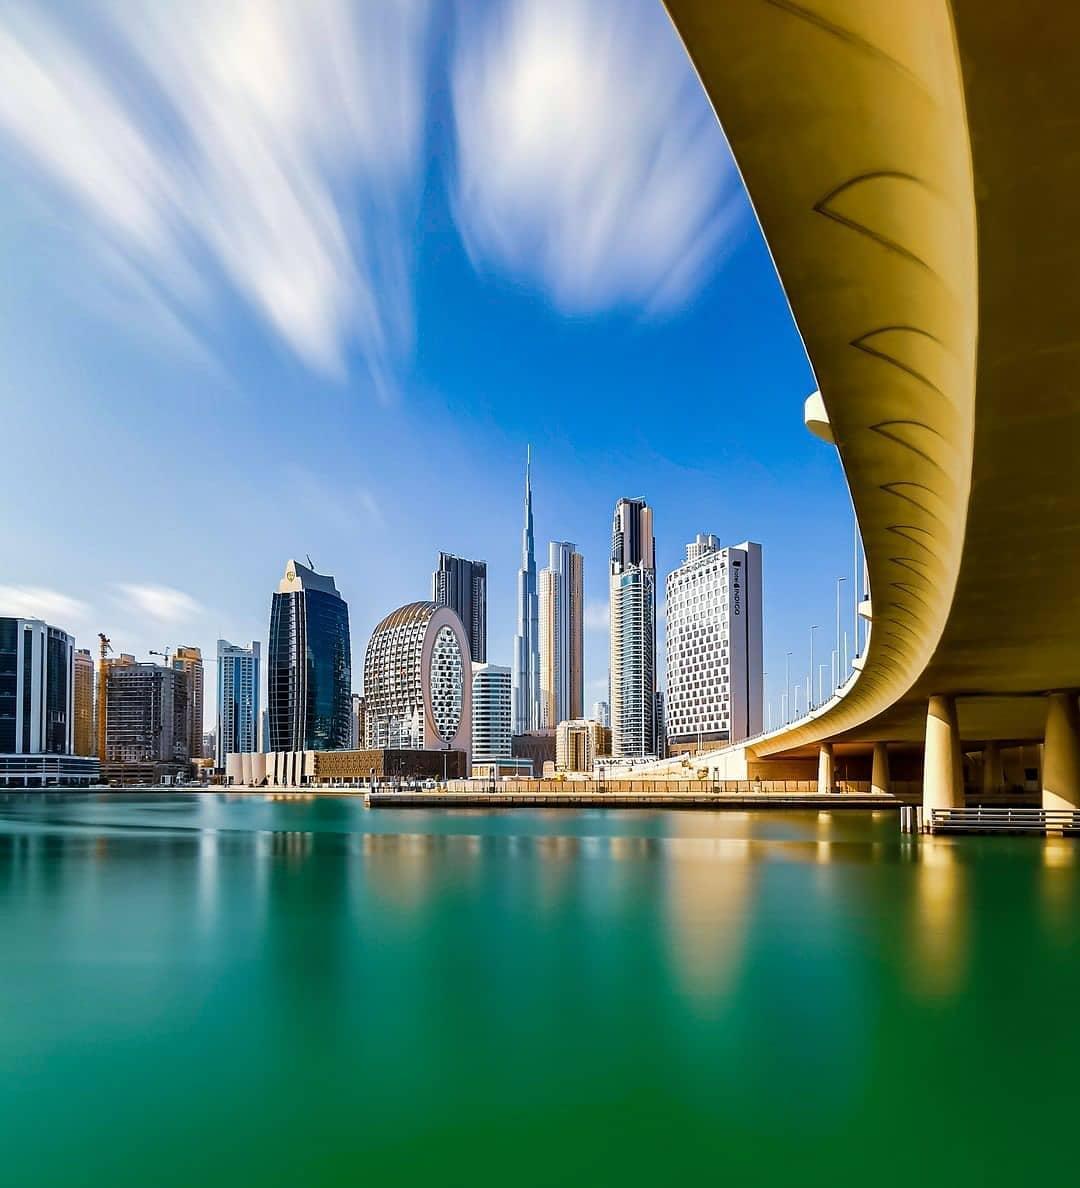 Be kind. Photo by ig:photoshamaa #PicsDubai #Dubai #MyDubai #VisitDubai #PhotoOfTheDay #PicOfTheDay #InstaLike #City #Skyline #Skyscraper #Design #love #instagood #happy #travel #kind #patient #metropolis #happynewyear #newyear #2020 #goodmorning